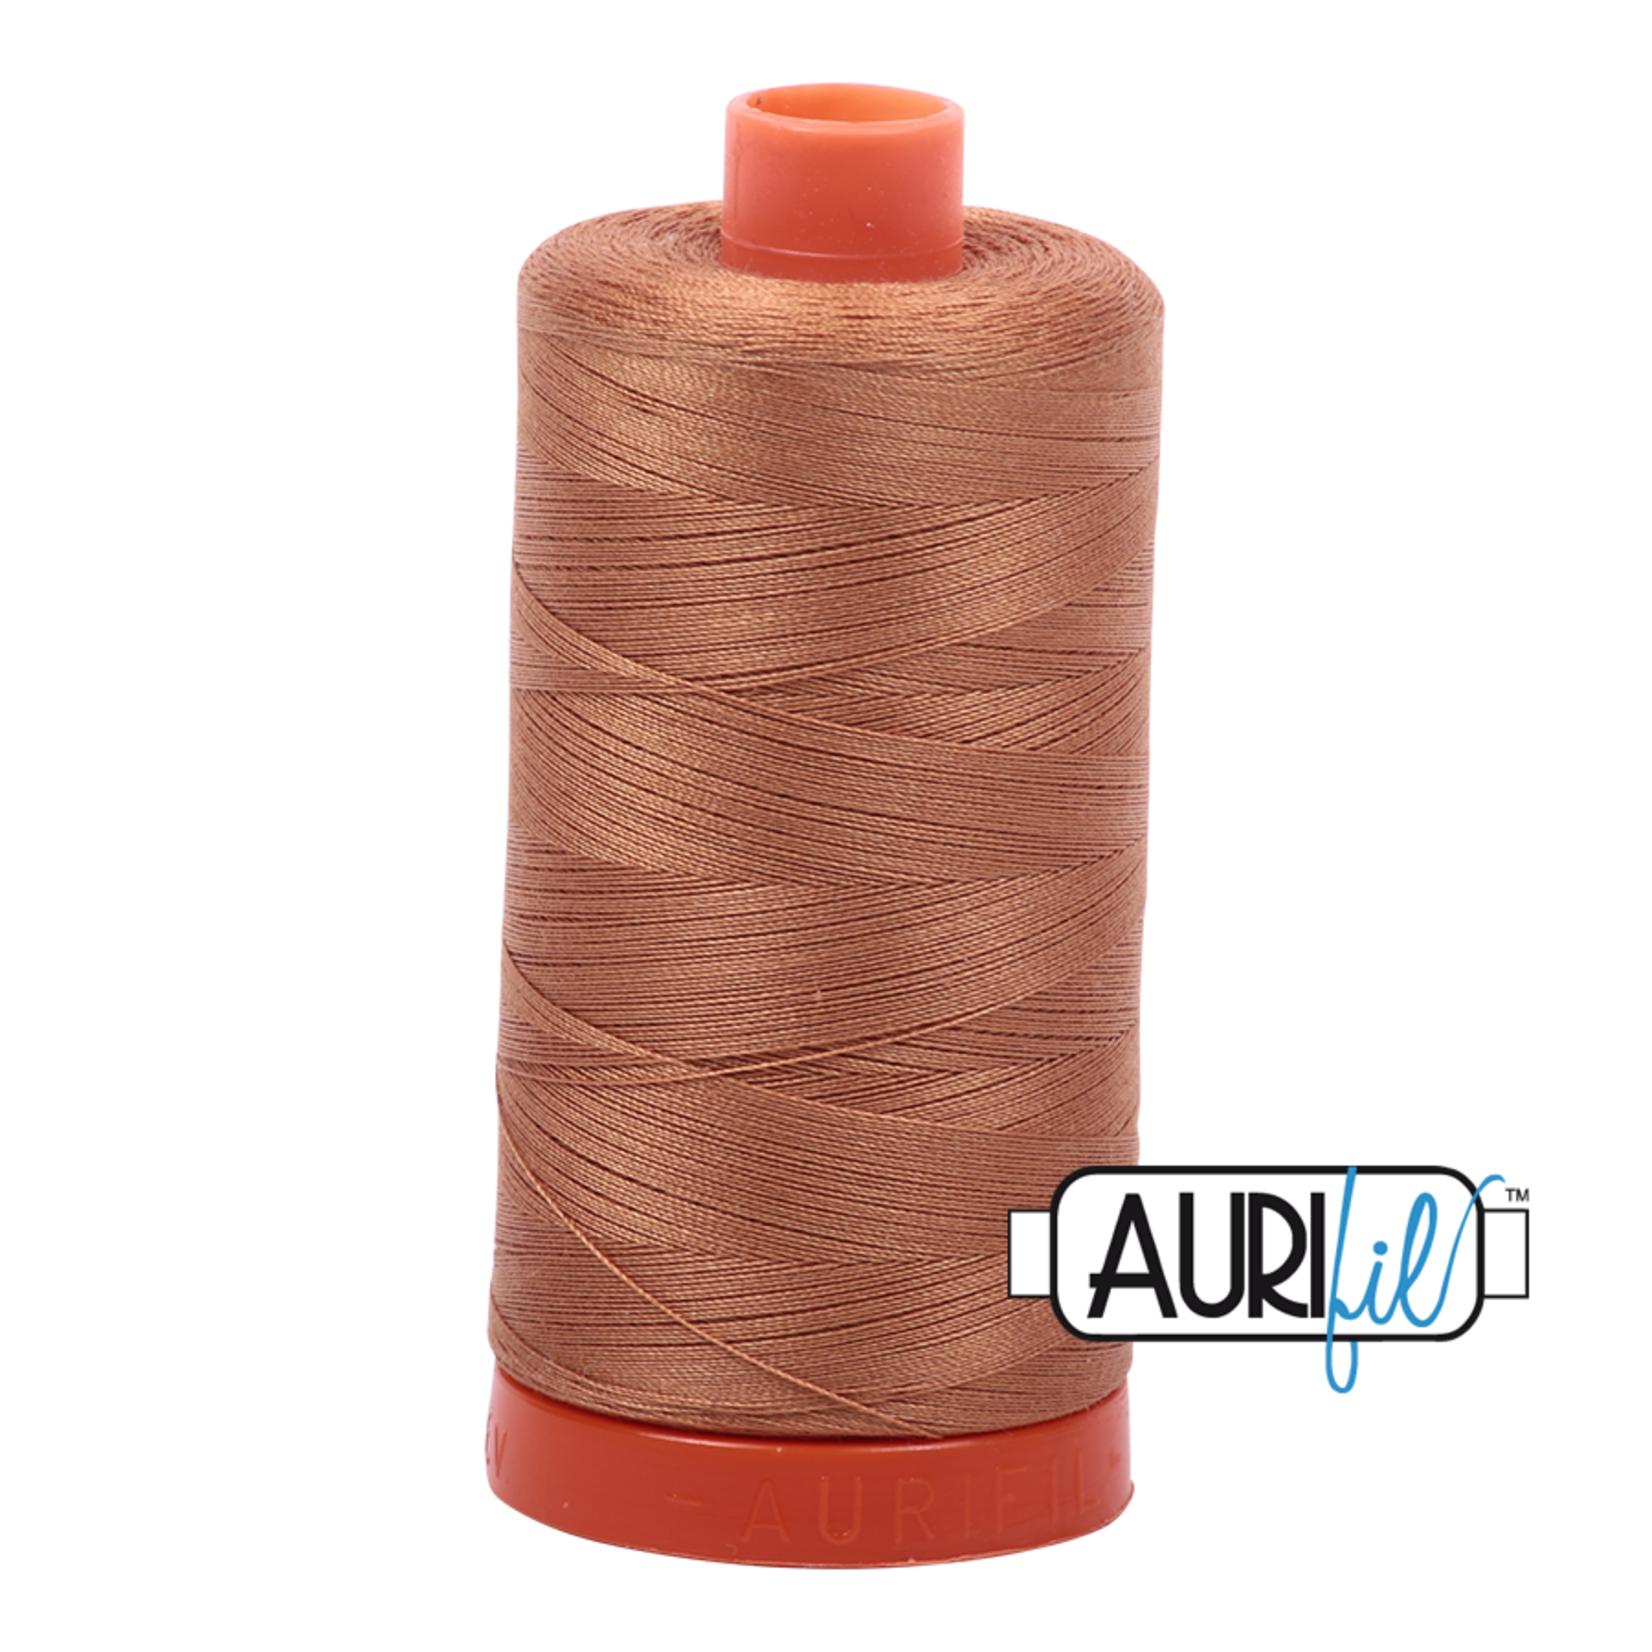 AURIFIL AURIFIL 50 WT Light Cinnamon 2335